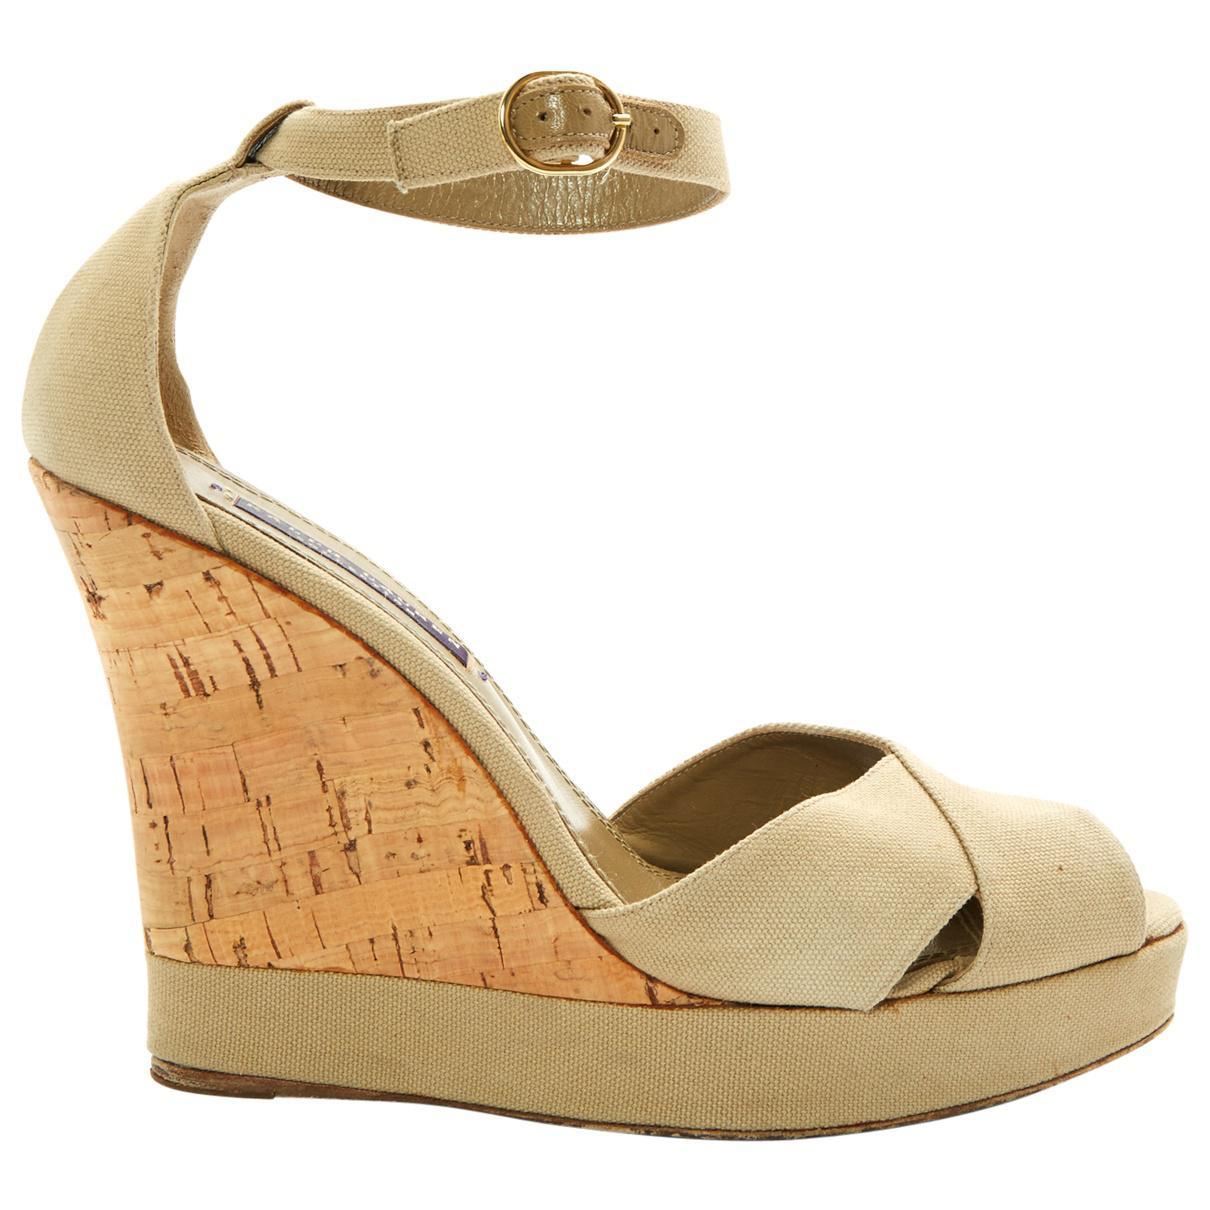 Pre-owned - Cloth sandals Ralph Lauren goivI7she3